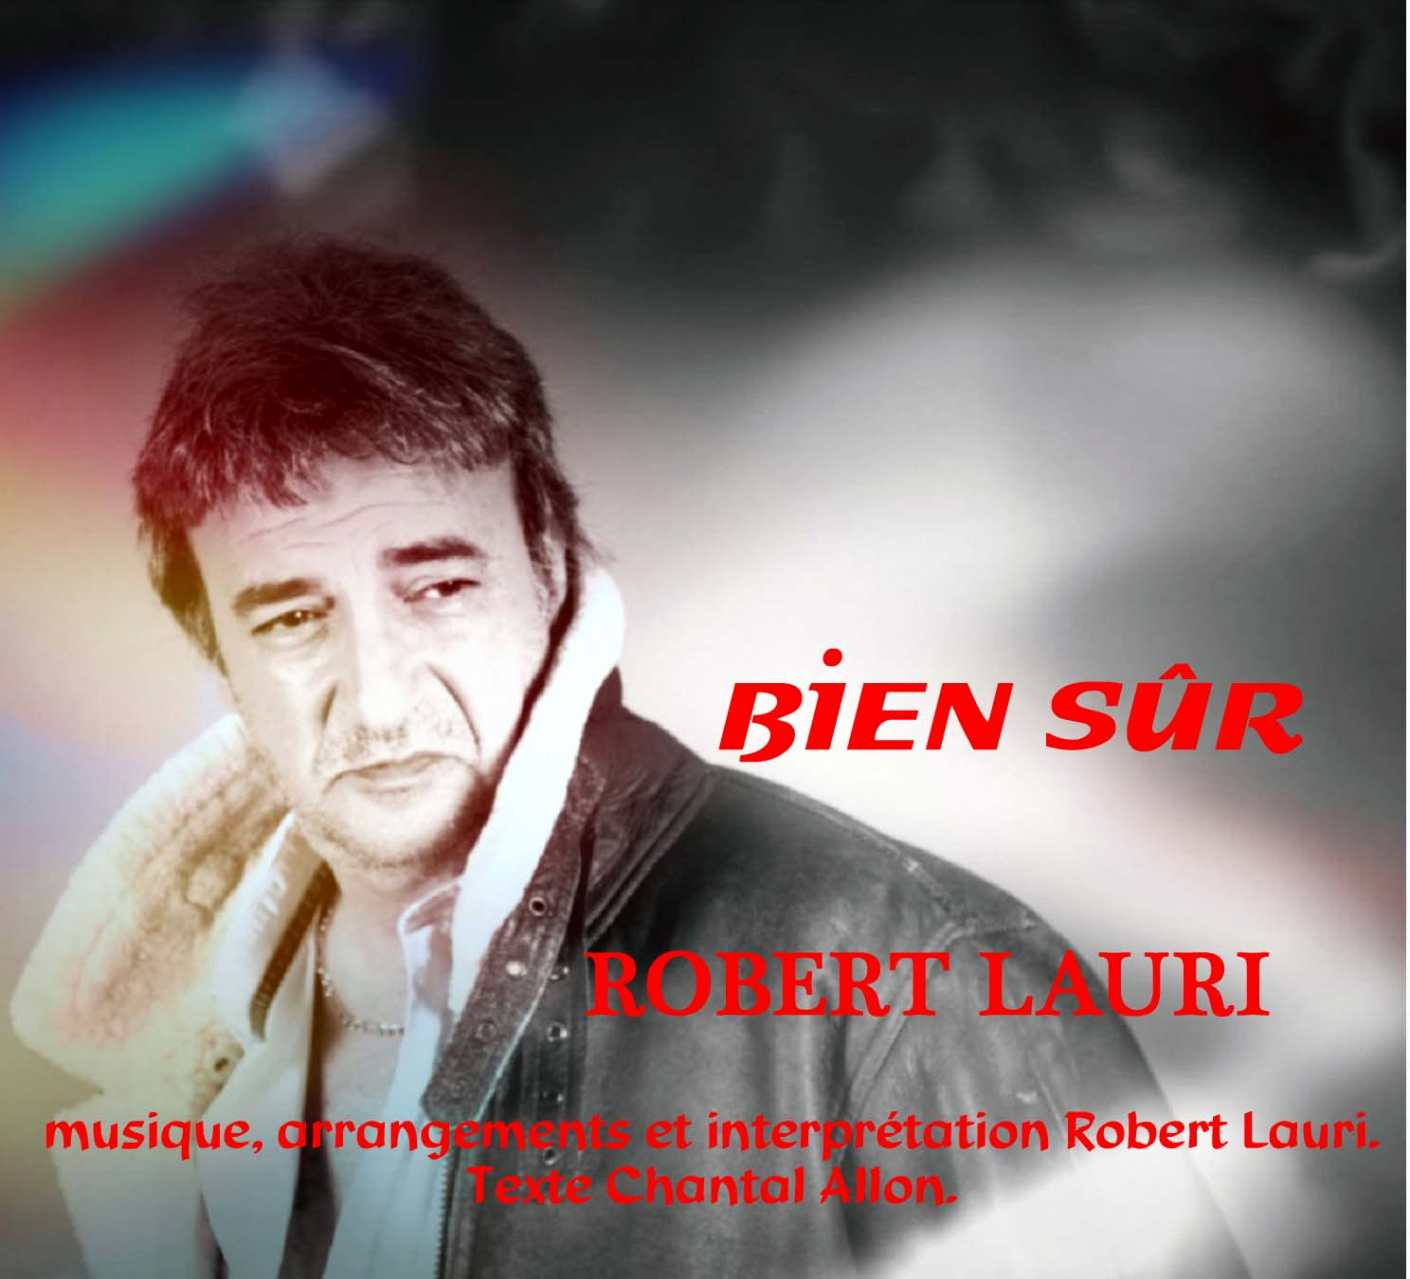 Bien sûr - Robert Lauri